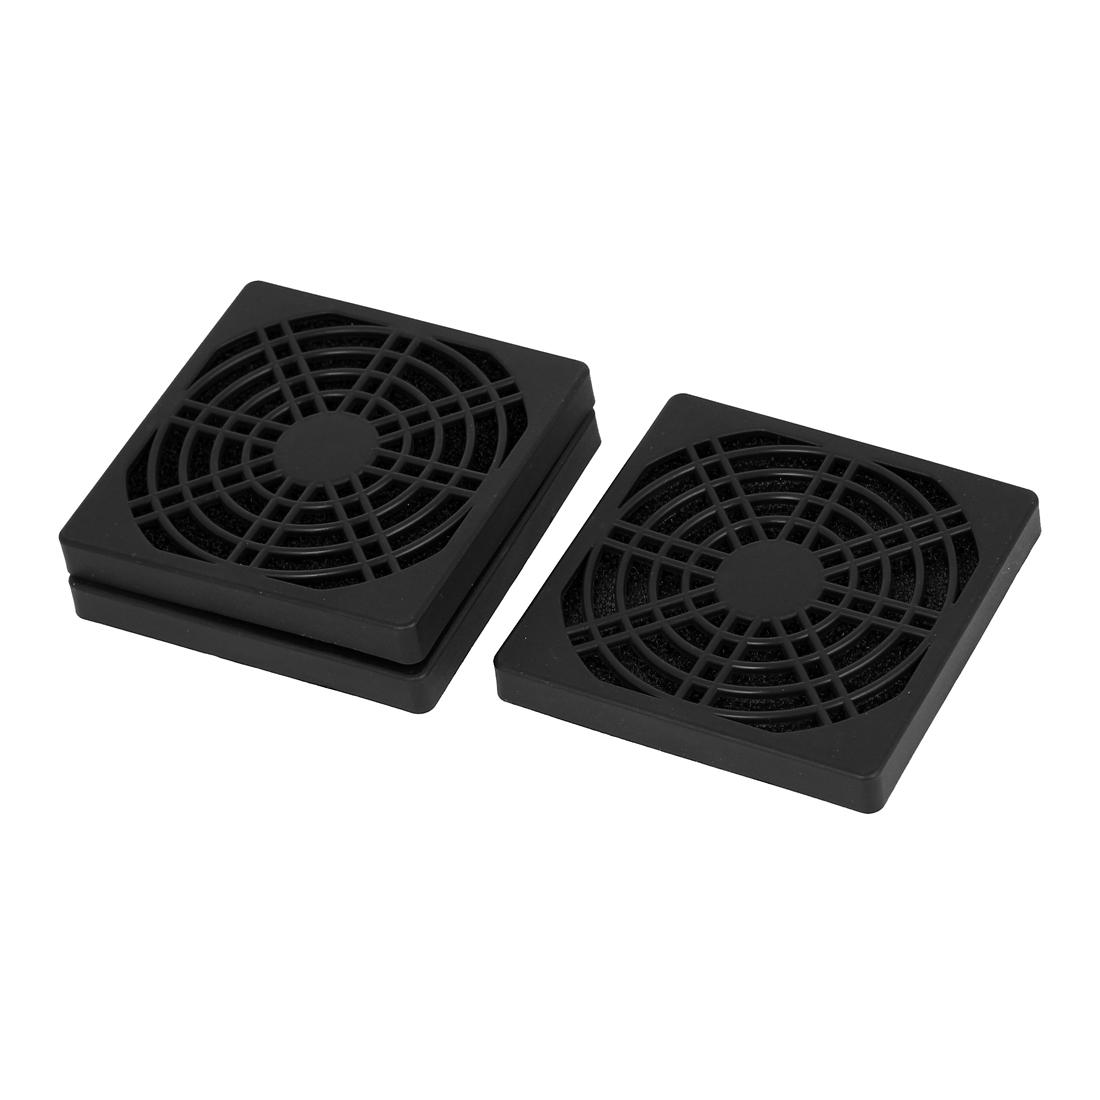 3pcs 85mm Black Plastic Computer PC Dustproof Cooler Cooling Fan Case Cover Dust Filter Protector Heatsink Net